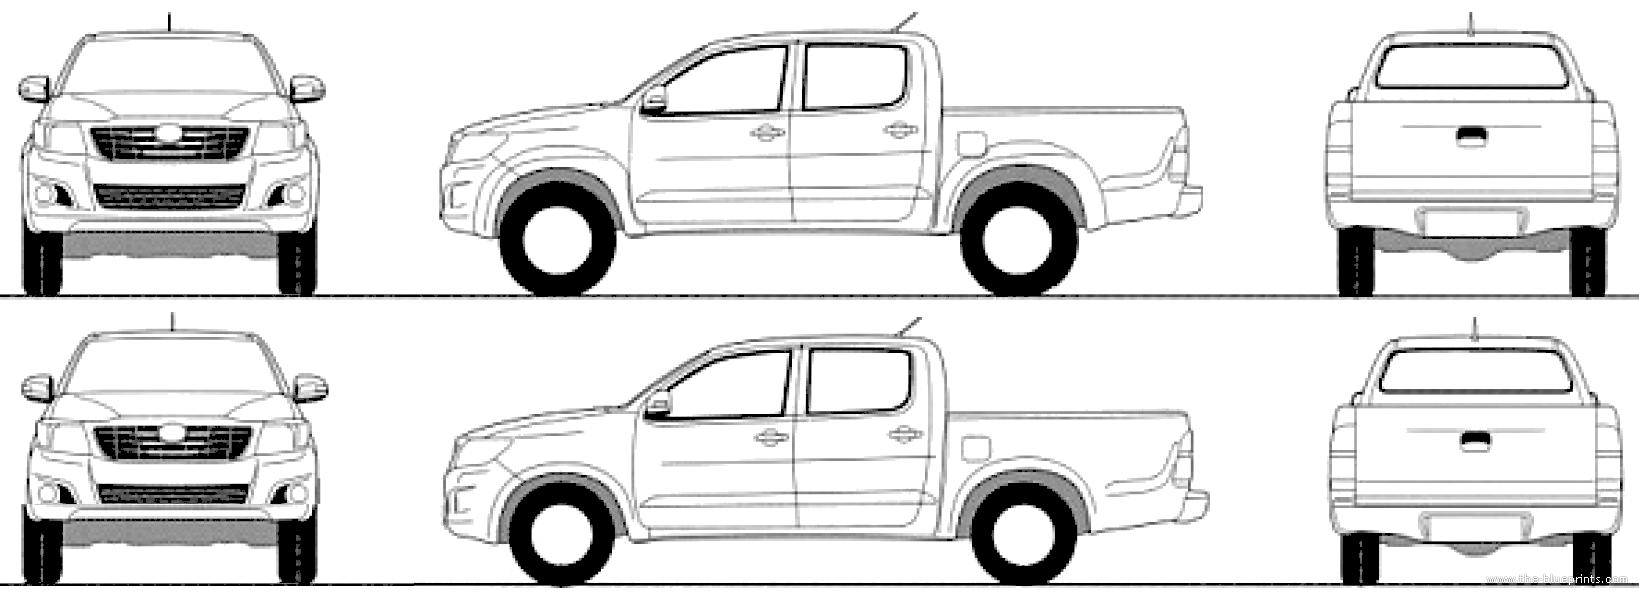 Blueprints cars toyota toyota hilux 2015 toyota hilux 2015 malvernweather Gallery